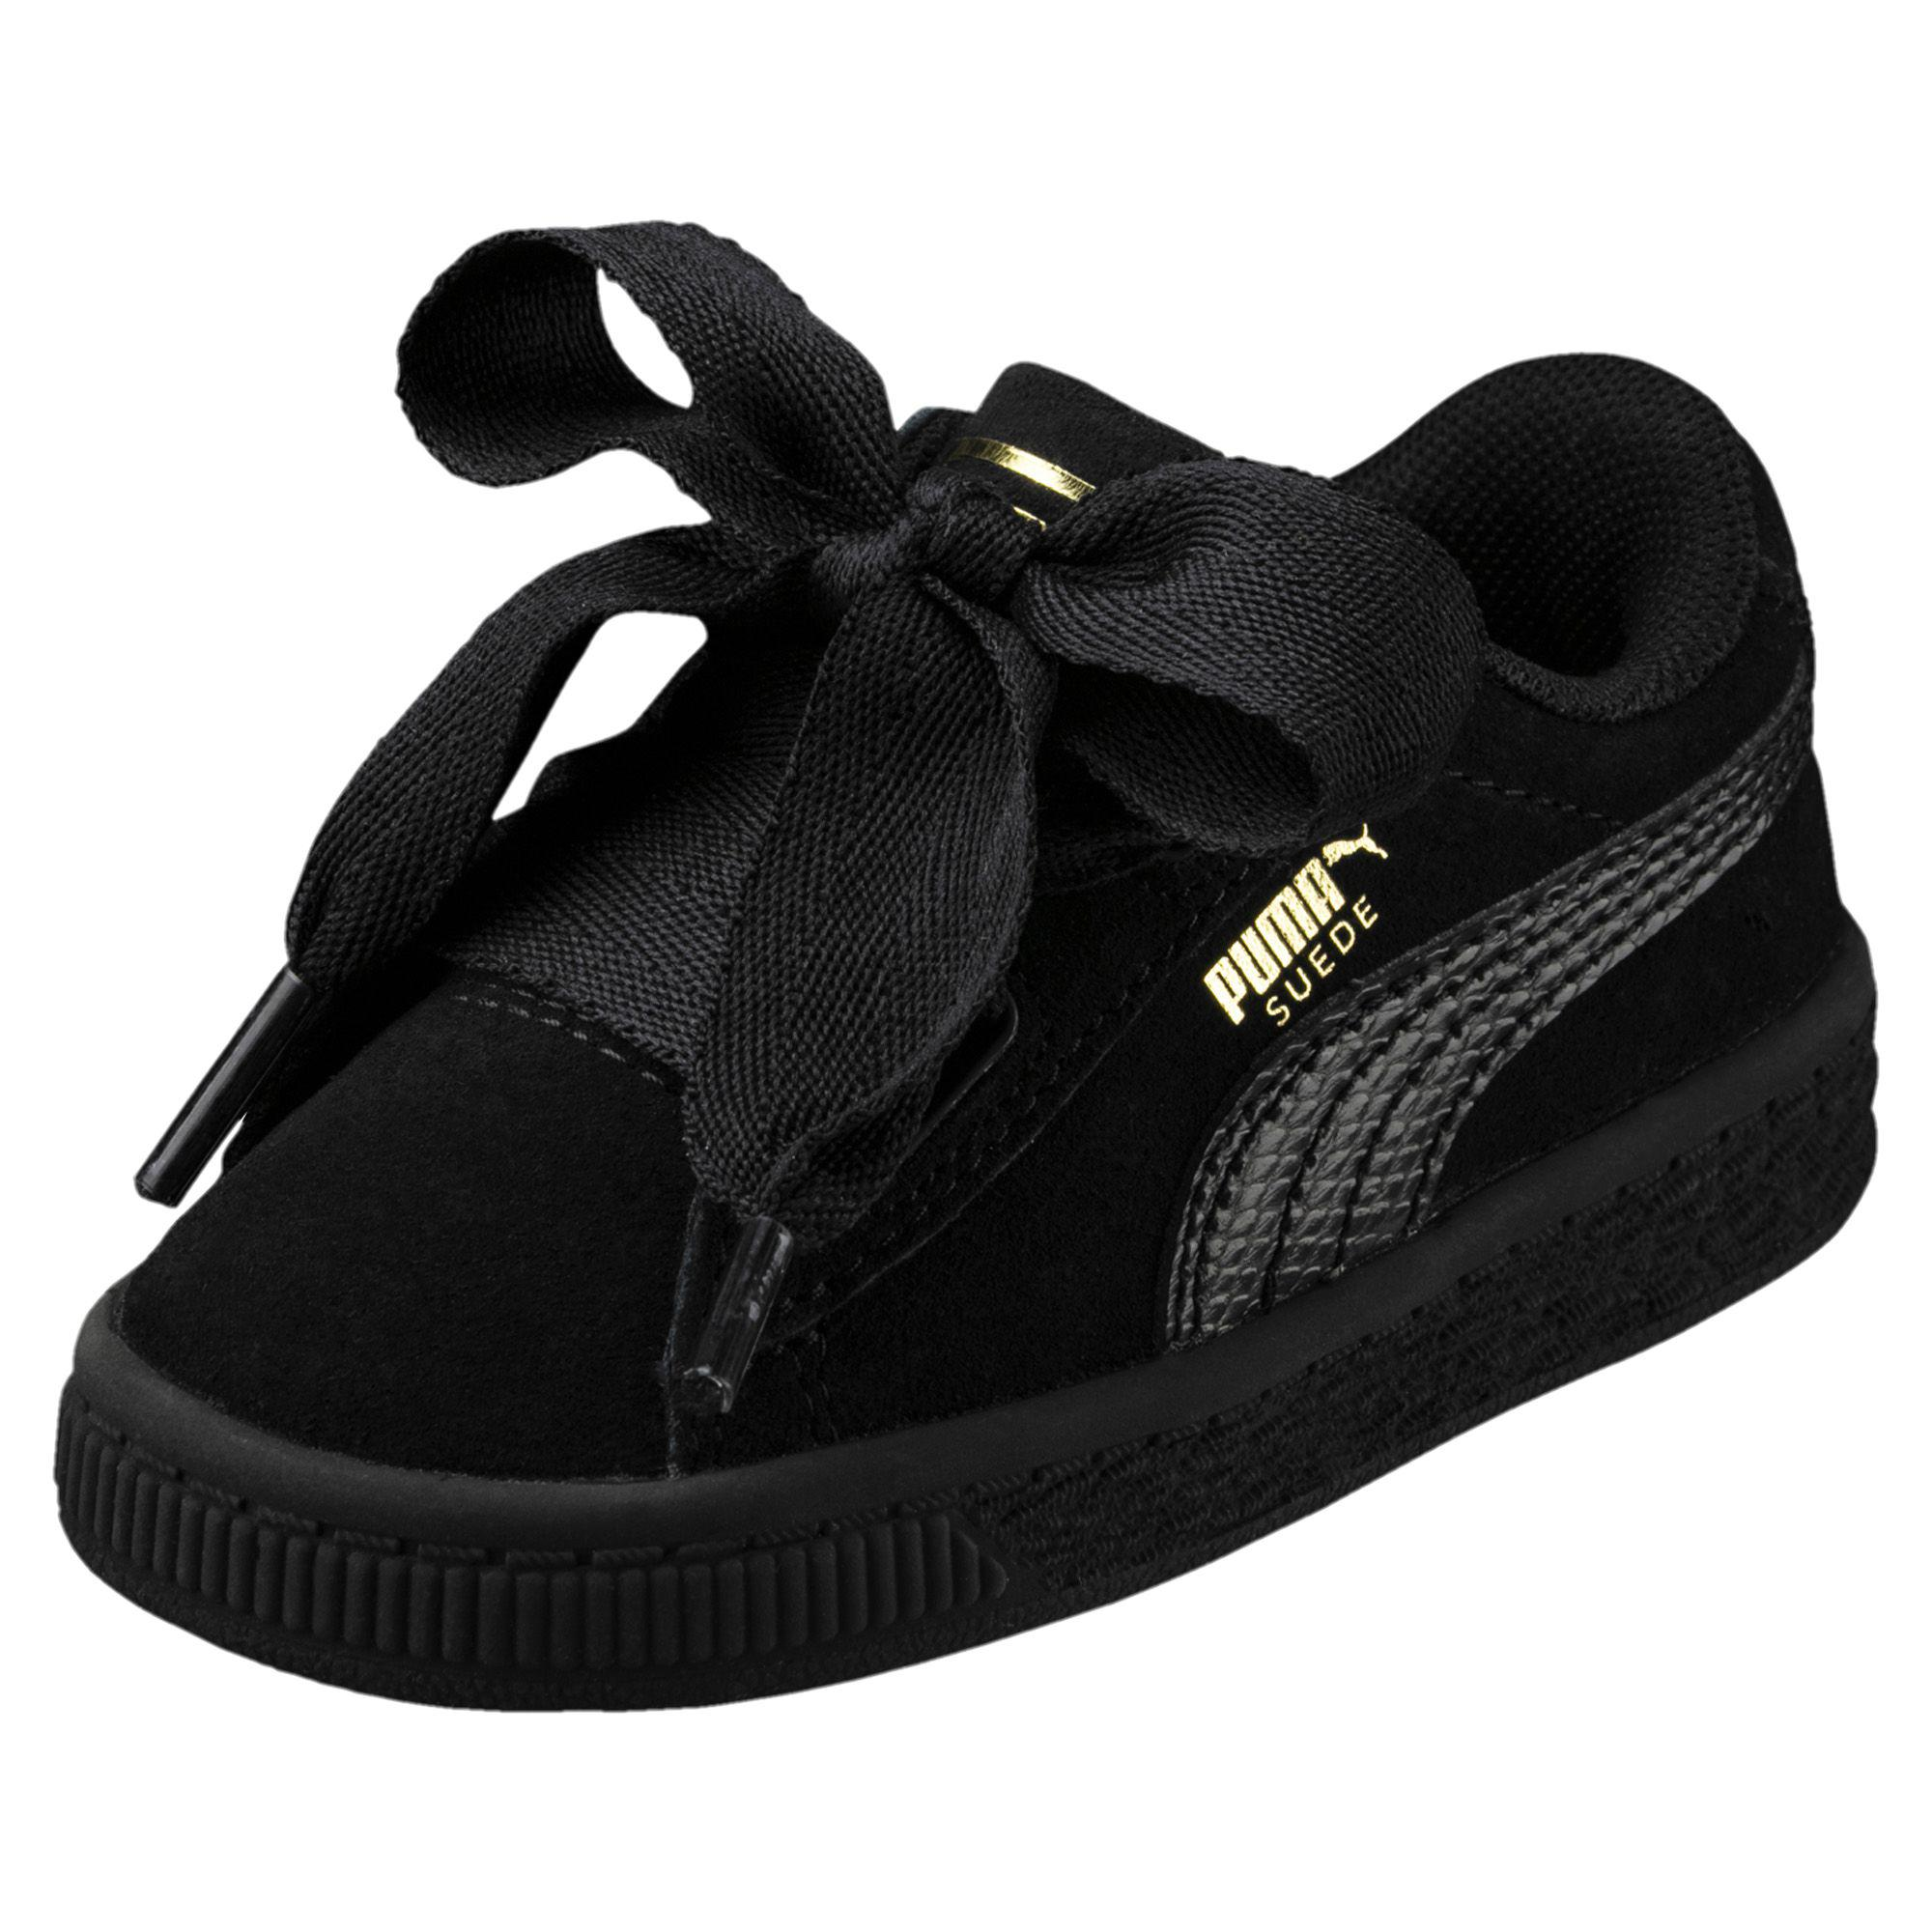 27310a90e269 Lyst - PUMA Suede Heart Snake Girls  Sneakers in Black